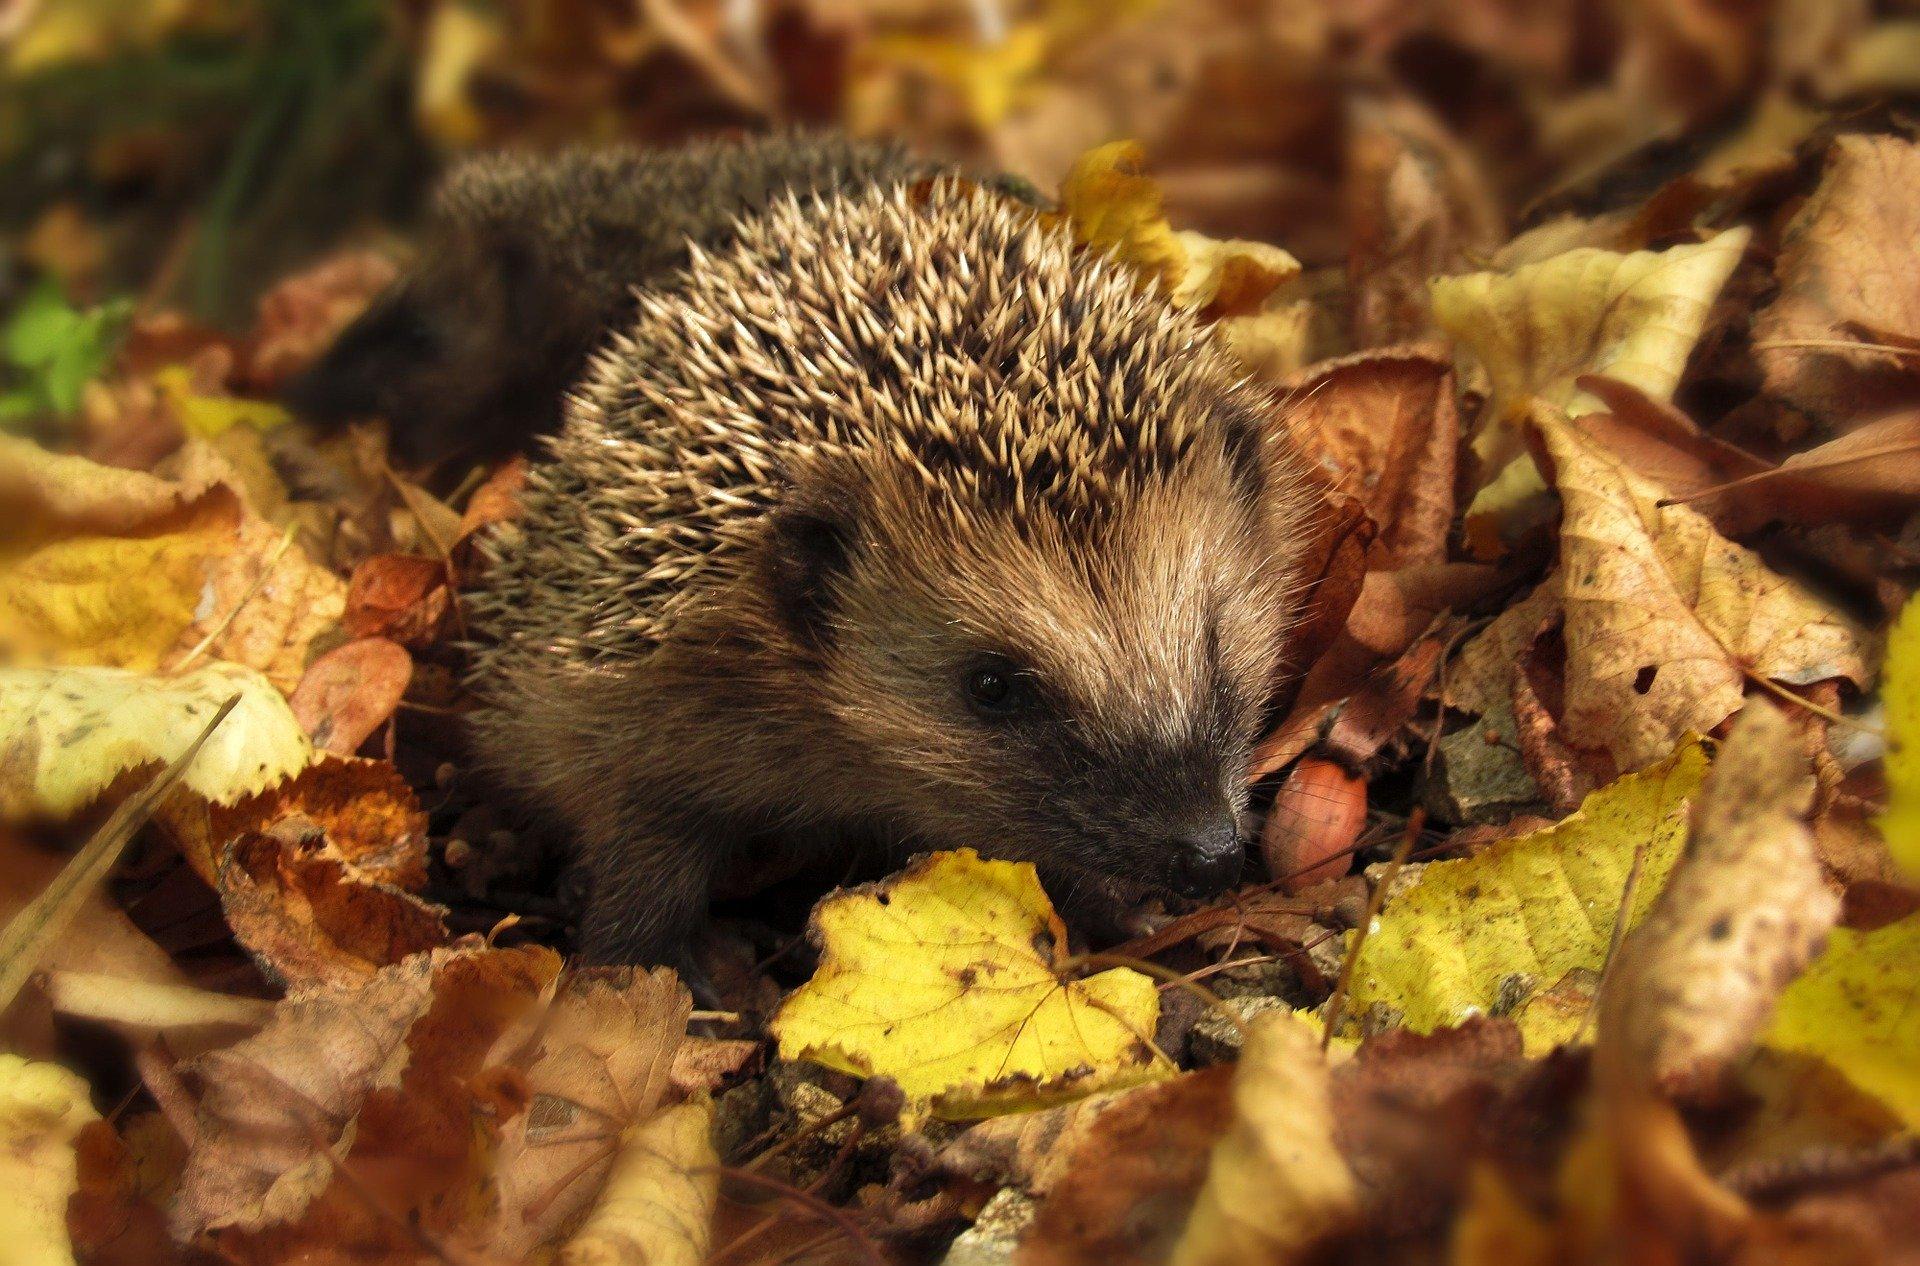 http://files.biolovision.net/haute-savoie.lpo.fr/userfiles/Pixabay-hedgehog-9853151920.jpg